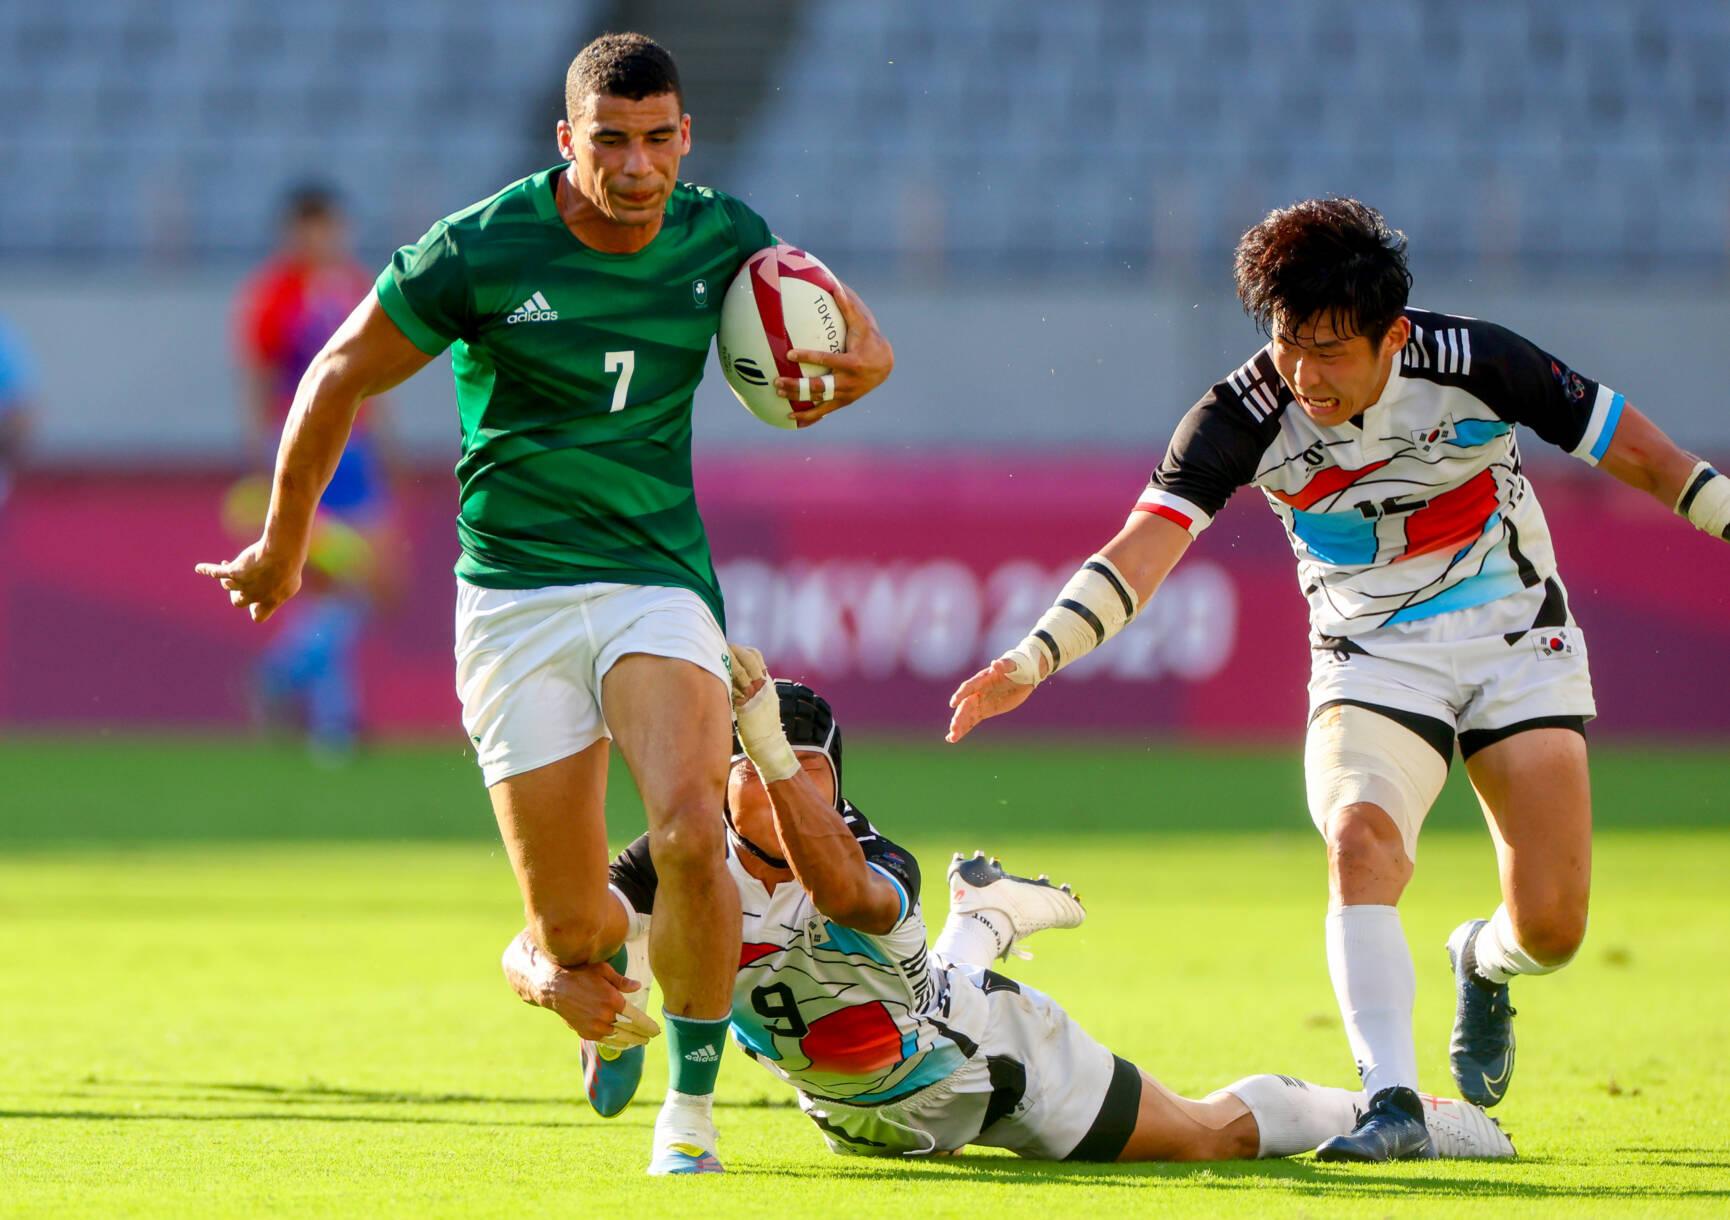 Ireland Set For Kenya Rematch After Five-Try Win Over Korea